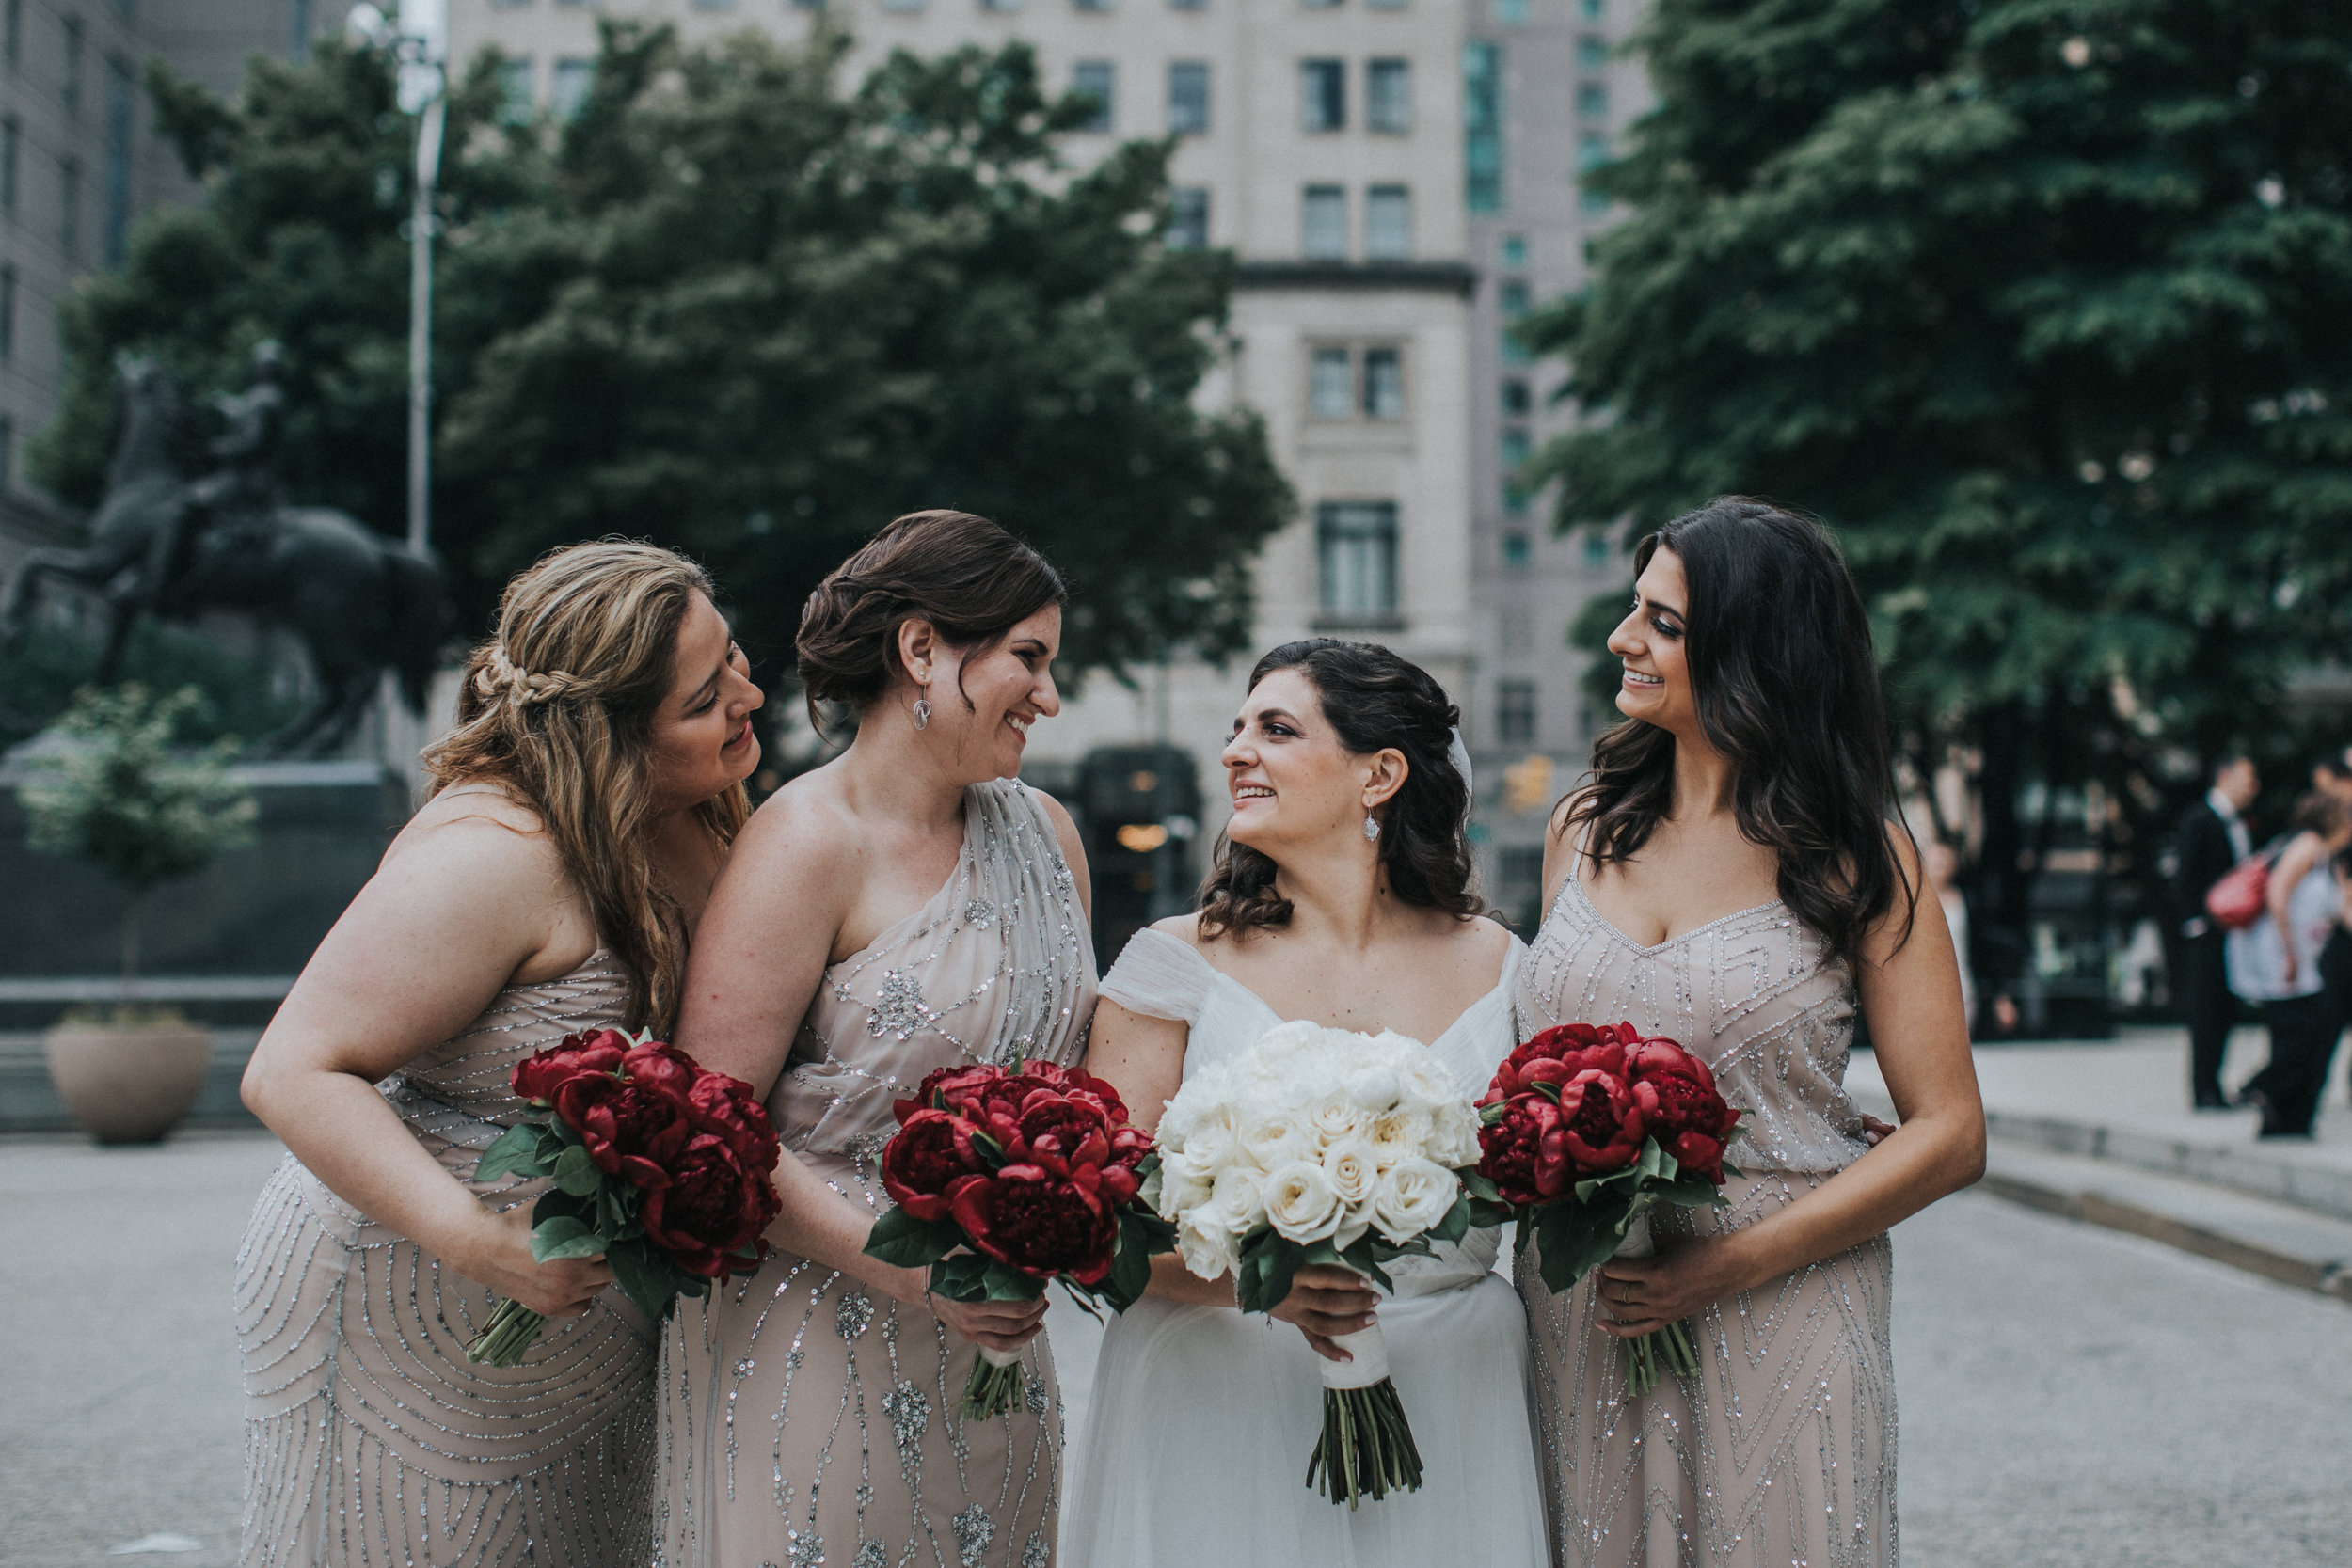 JennaLynnPhotography-NJWeddingPhotographer-Philadelphia-Wedding-ArtsBallroom-BridalParty-16.jpg